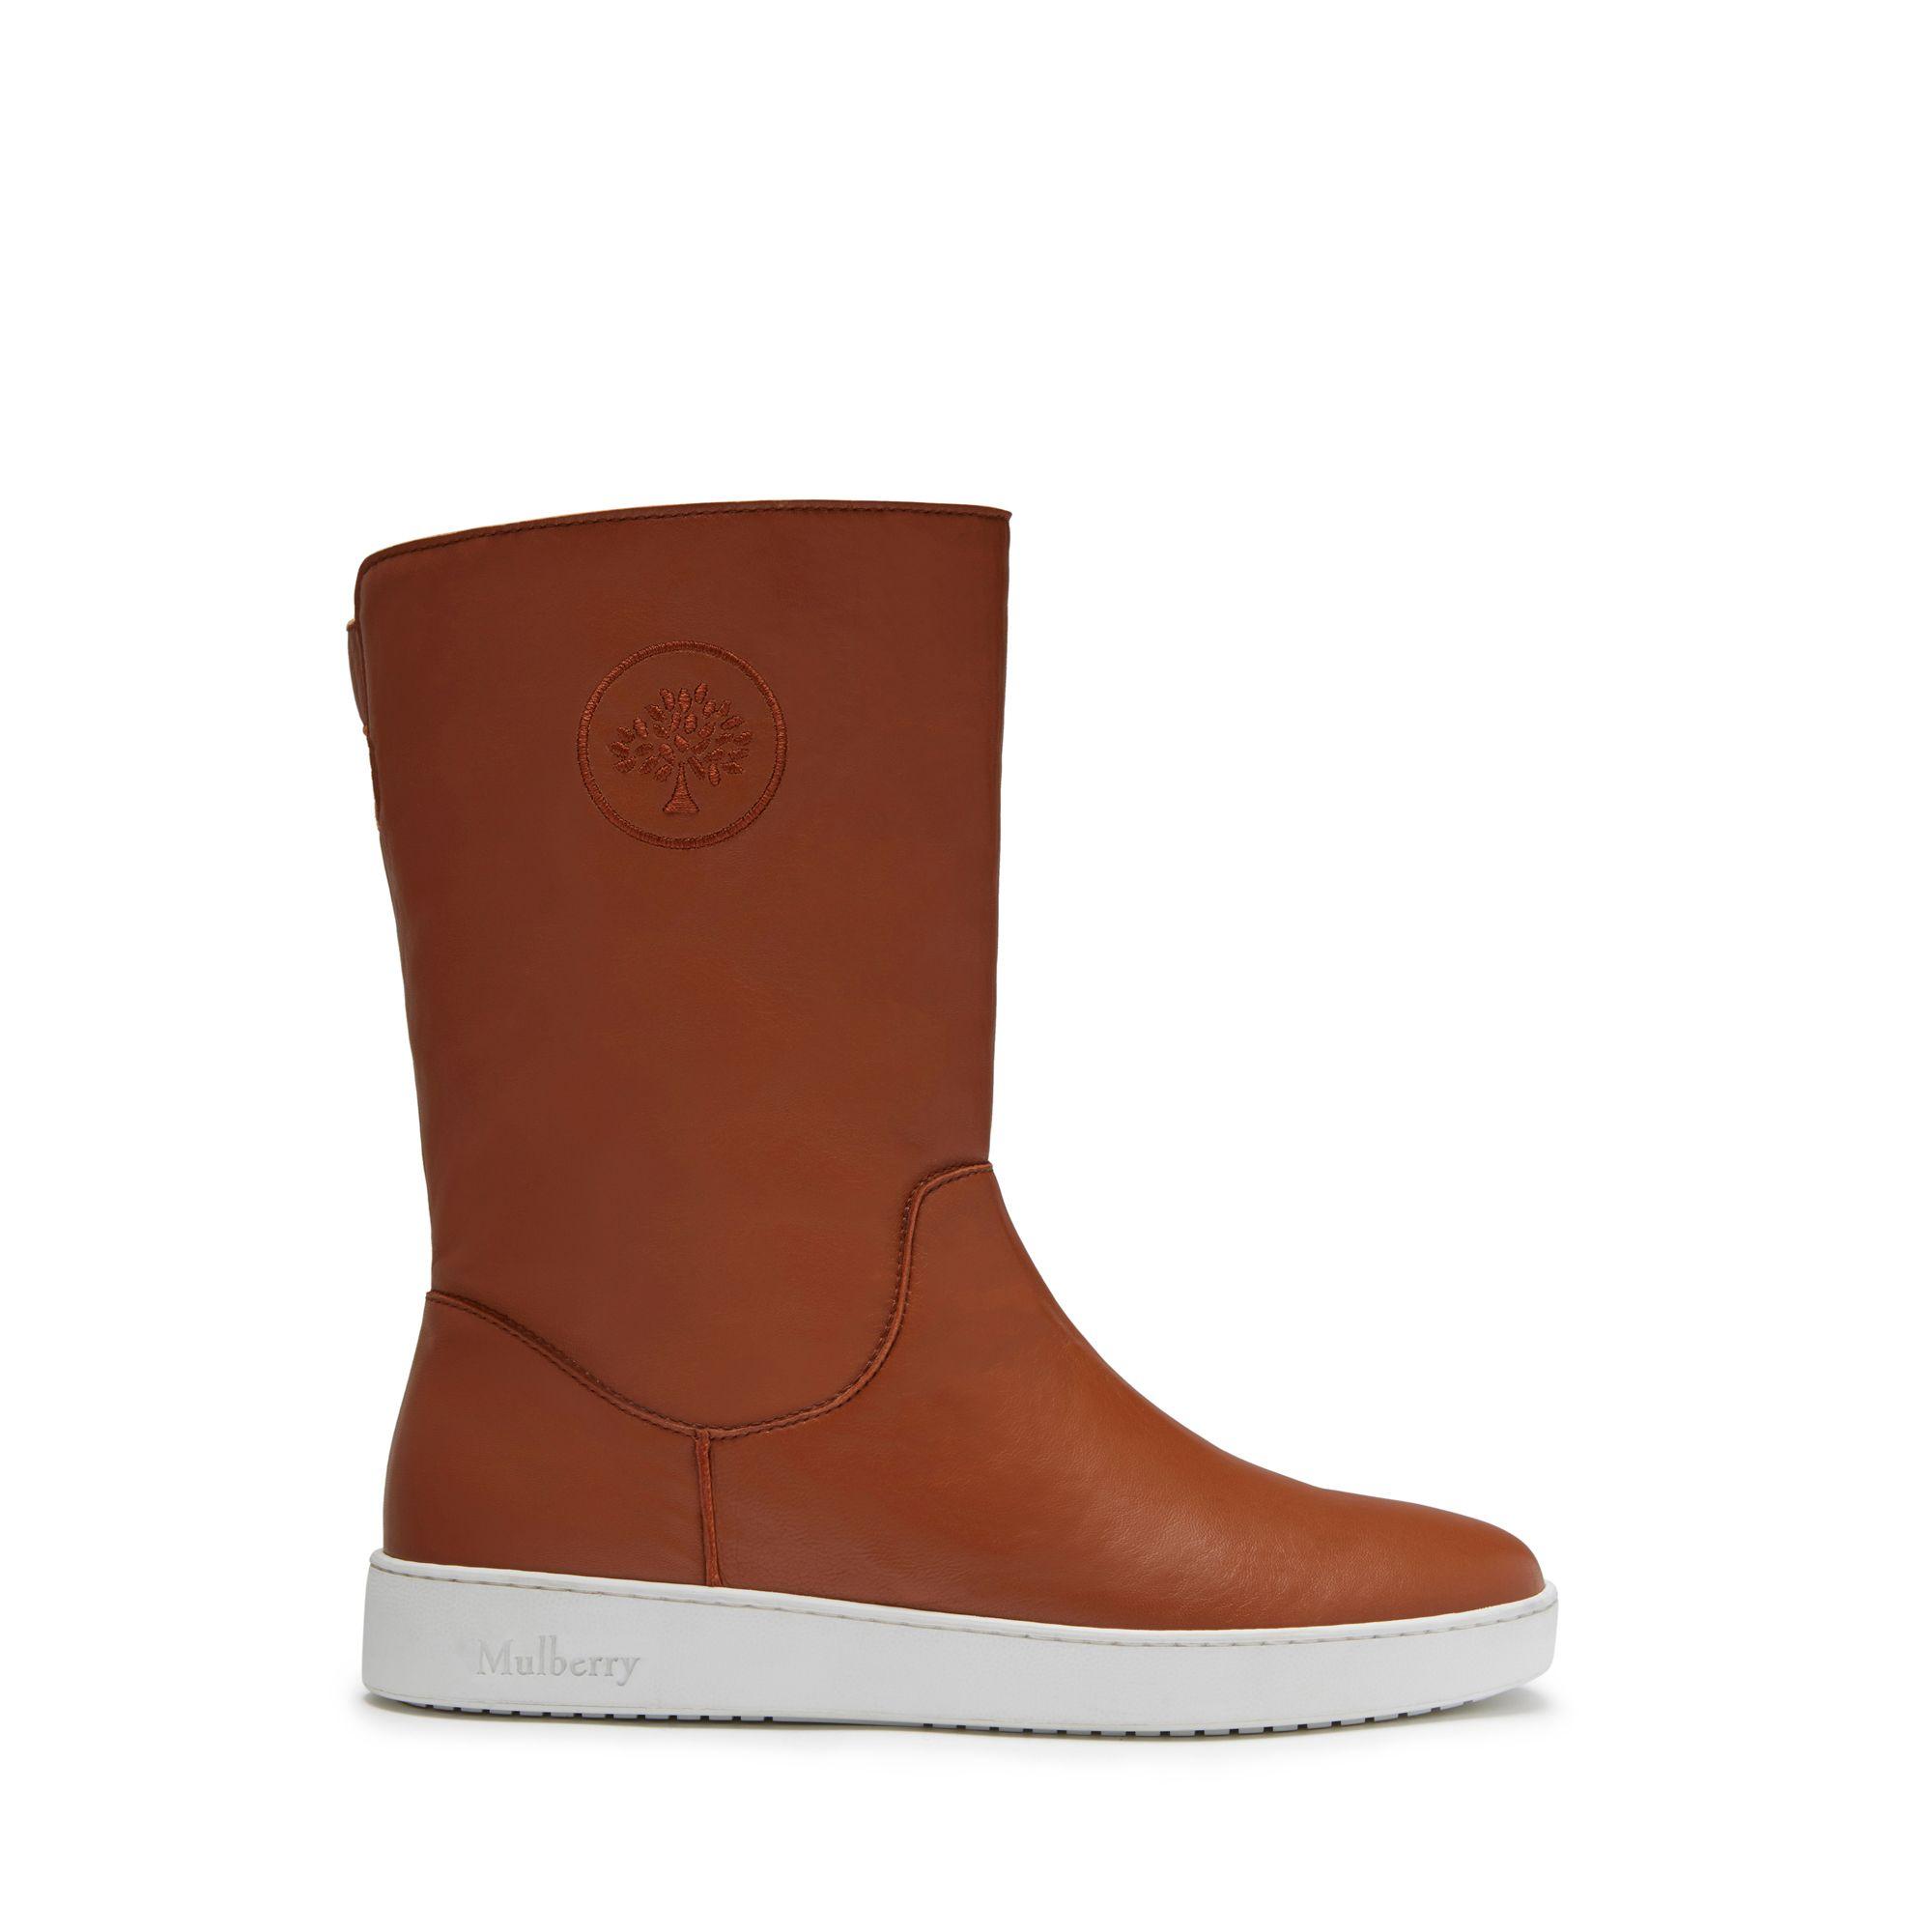 a76cc63661472 Shoes | Women | Mulberry